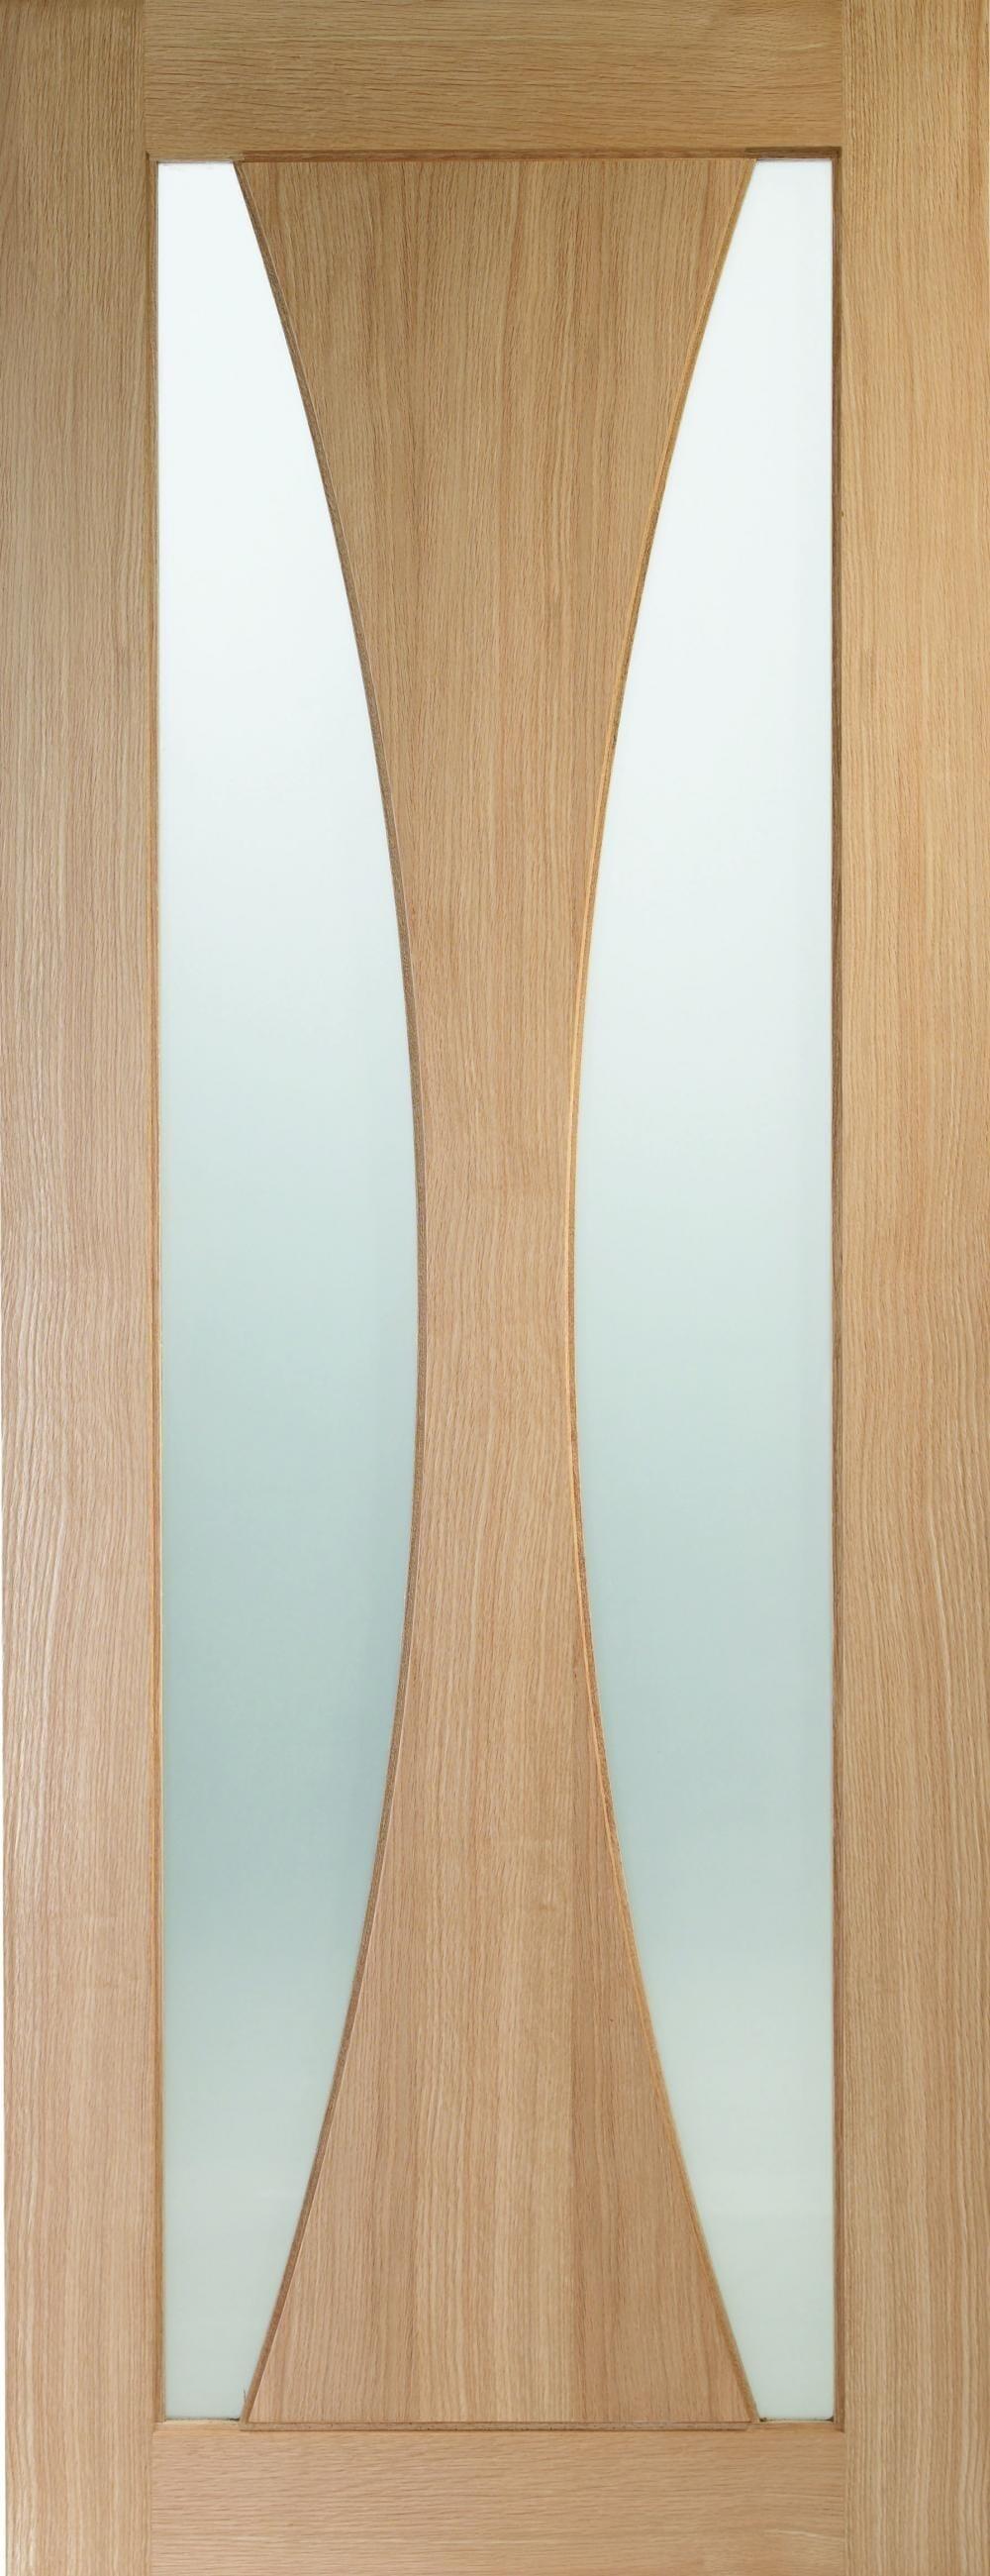 Verona Oak - Clear Glass Fire Door Image